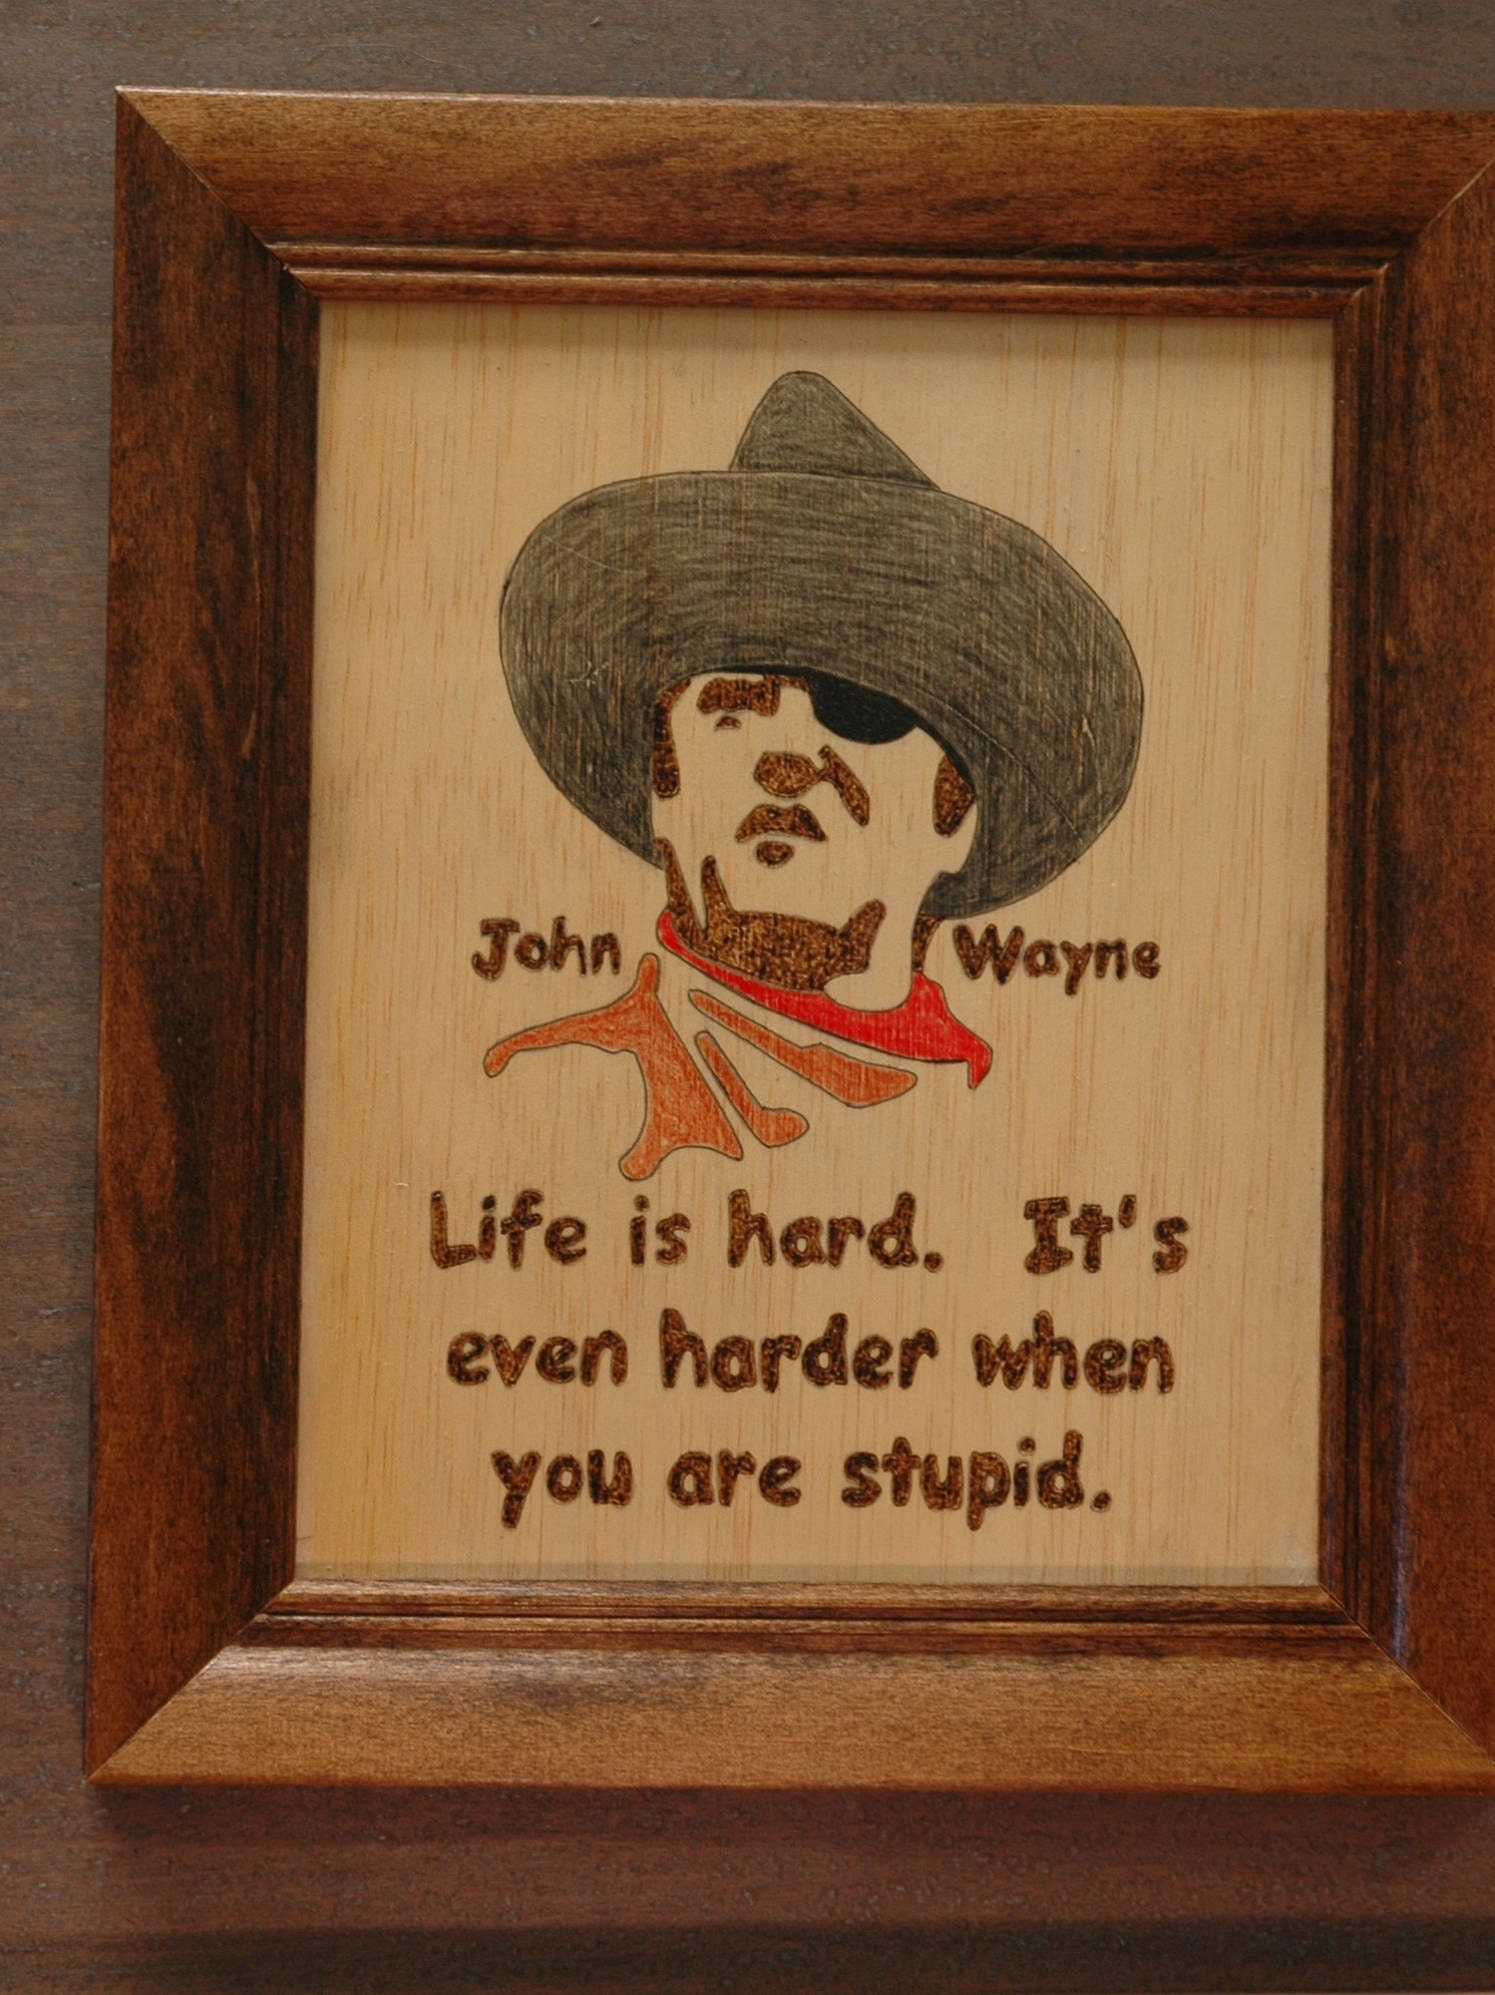 John Wayne Quote Life Is Hard John Wayne Wood Burning Portraits And Quotes